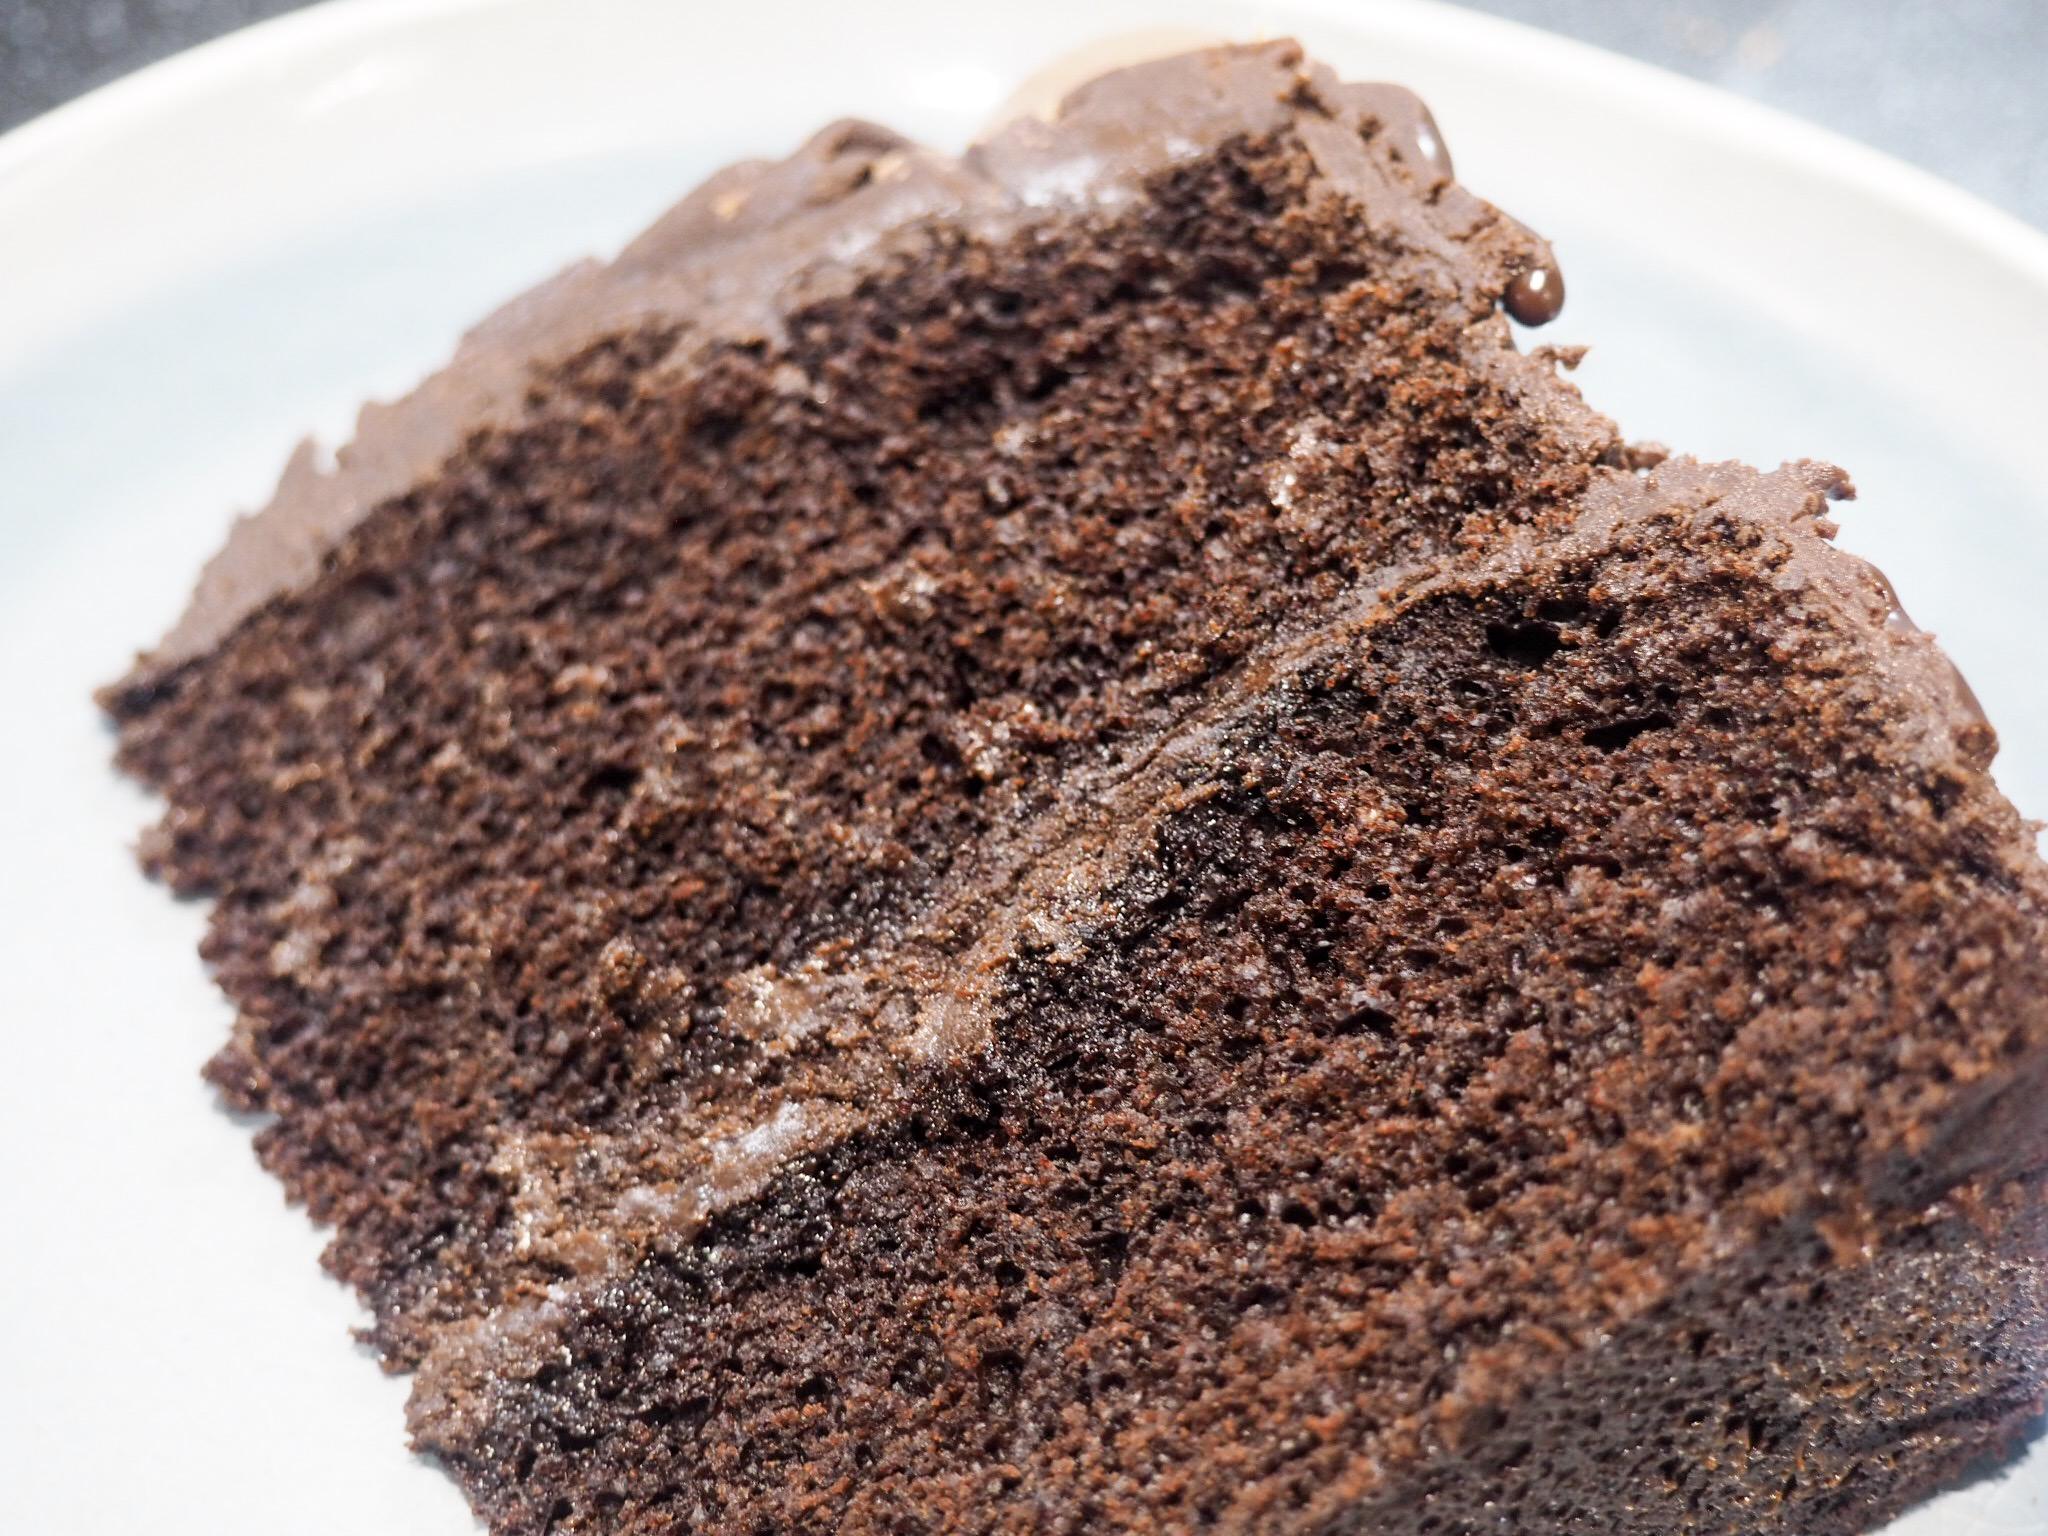 Chocolate sponge with chocolate ganache